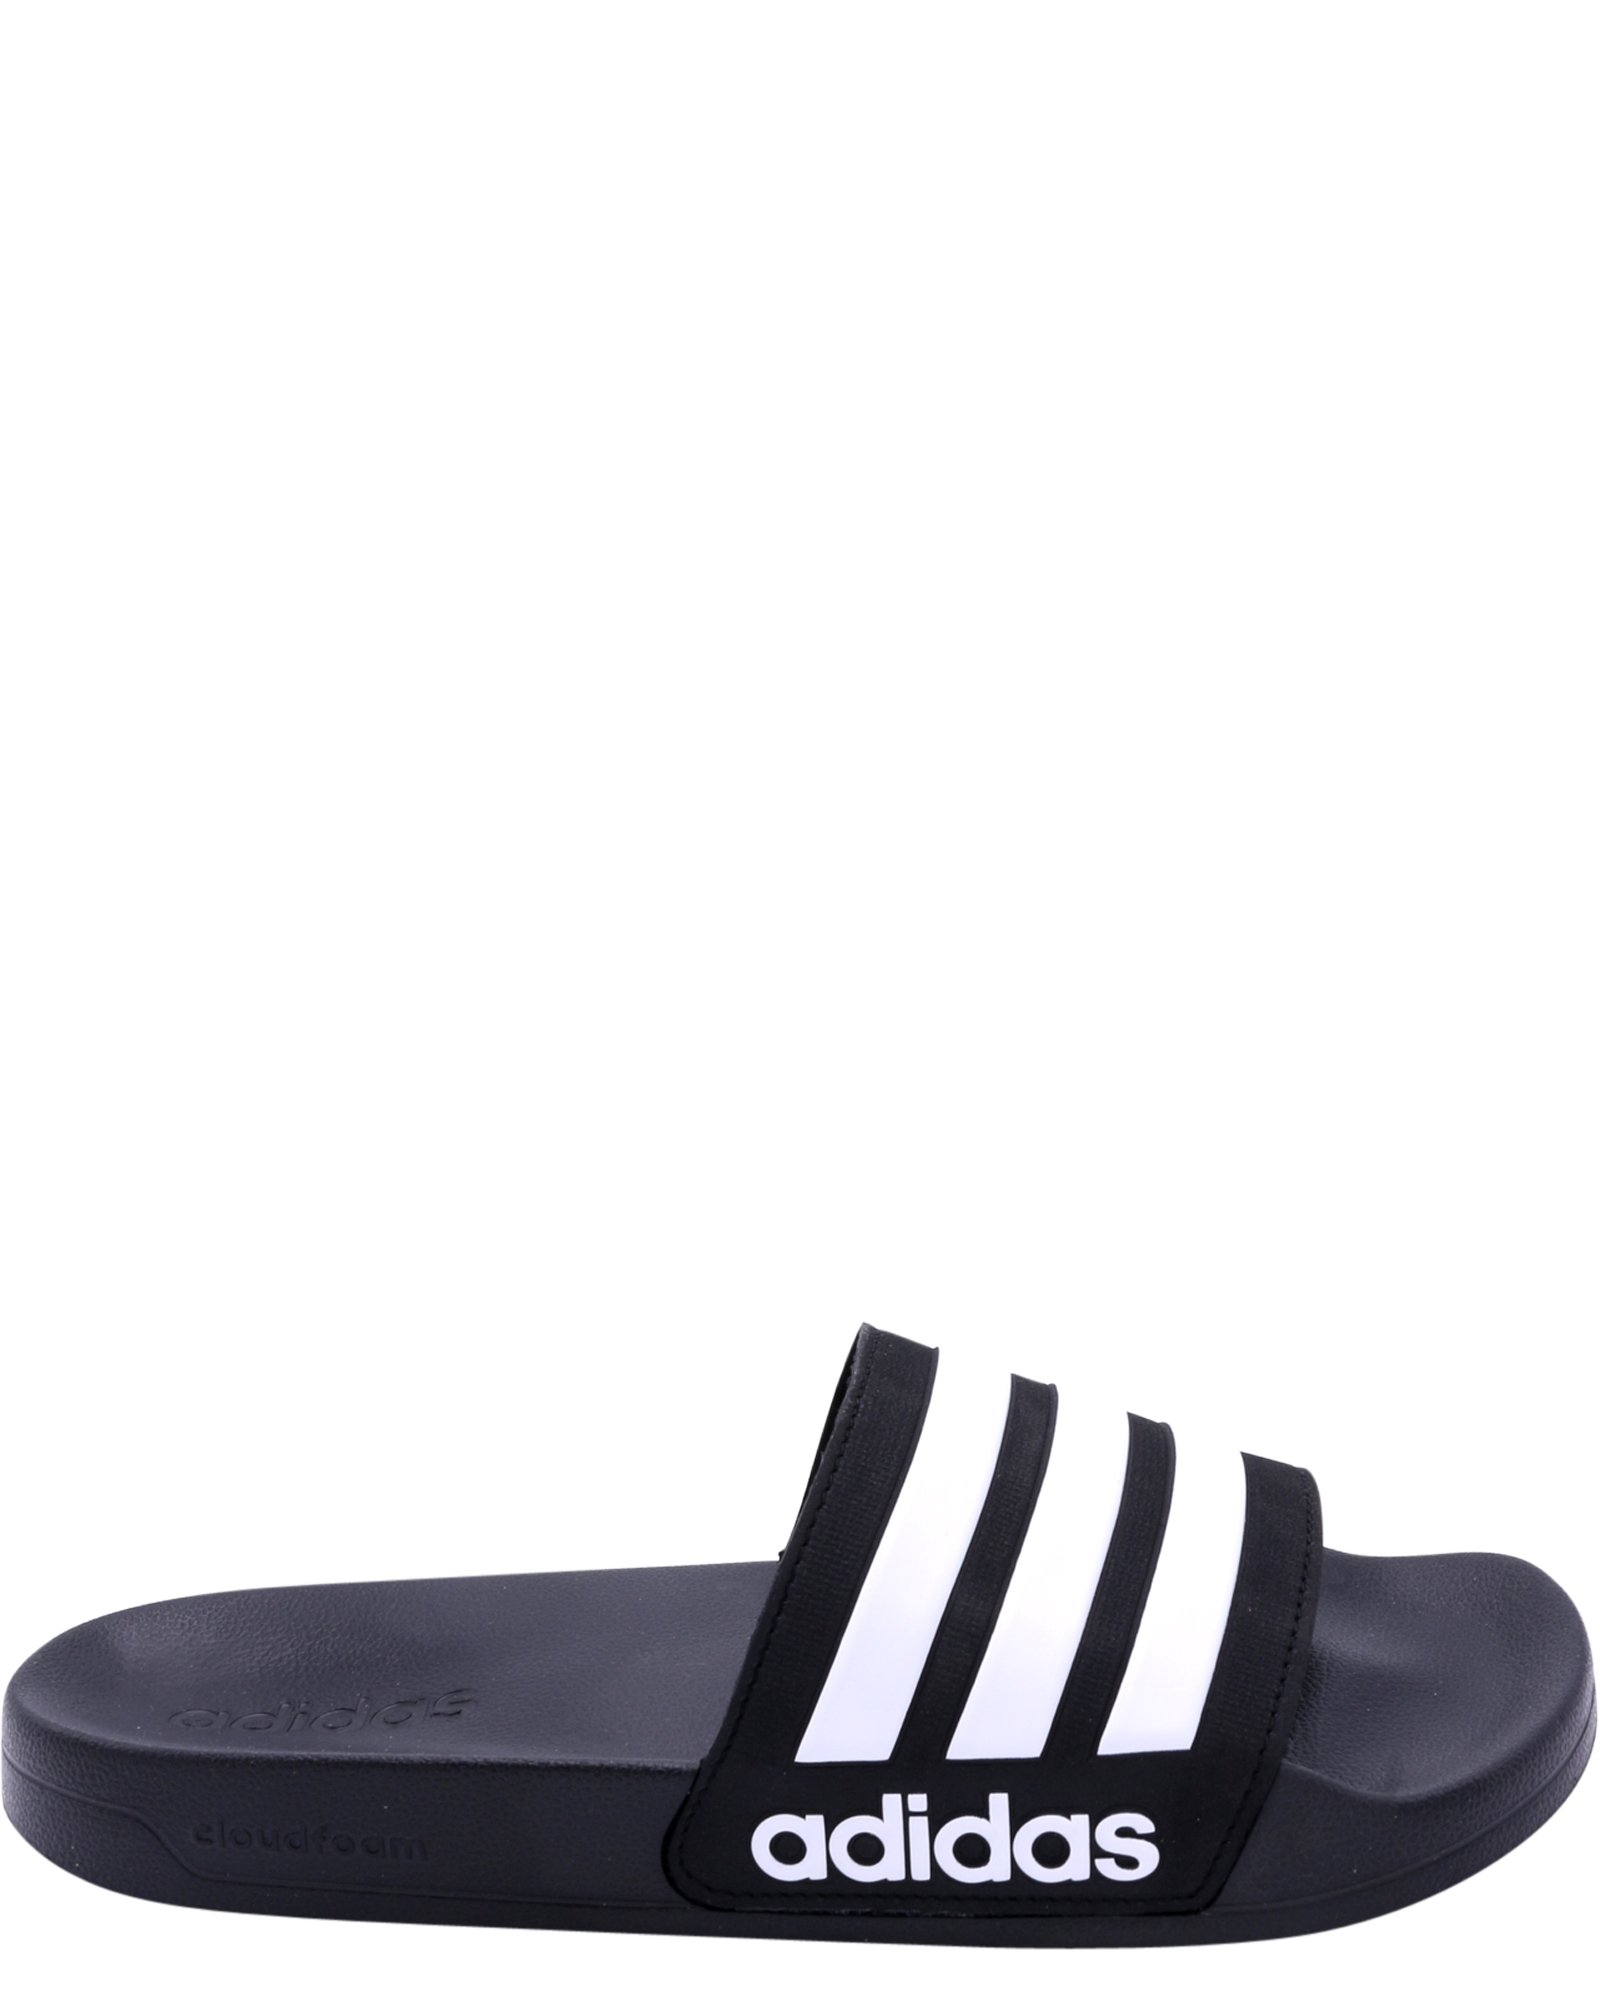 d3e4e3b132c6 Get Quotations · adidas Men s CF Adilette Slide Sandal